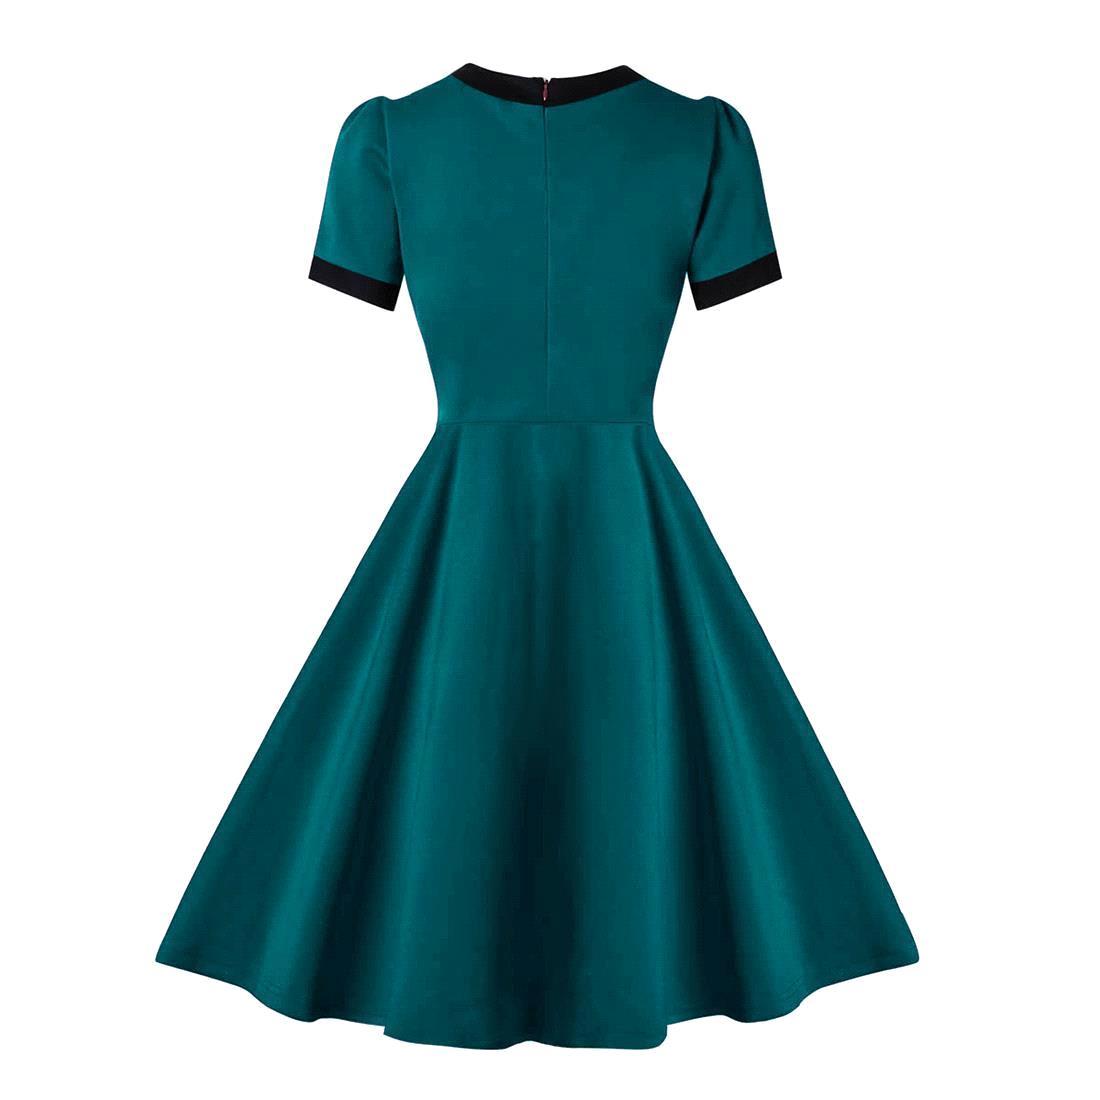 Classic Vintage dress cotton Picnic party dress Rockabilly Dress ...